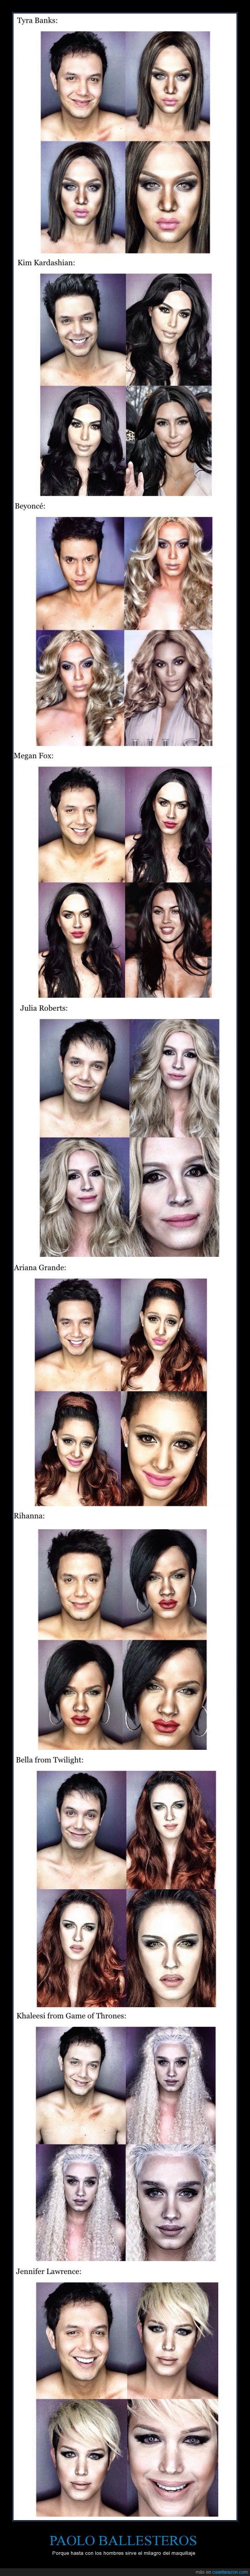 arianna grande,bella,famosas,famoso,jennifer lawrence,kardashian,khaleesi,maquillaje,megan fox,milagro,transformacion,tyra banks